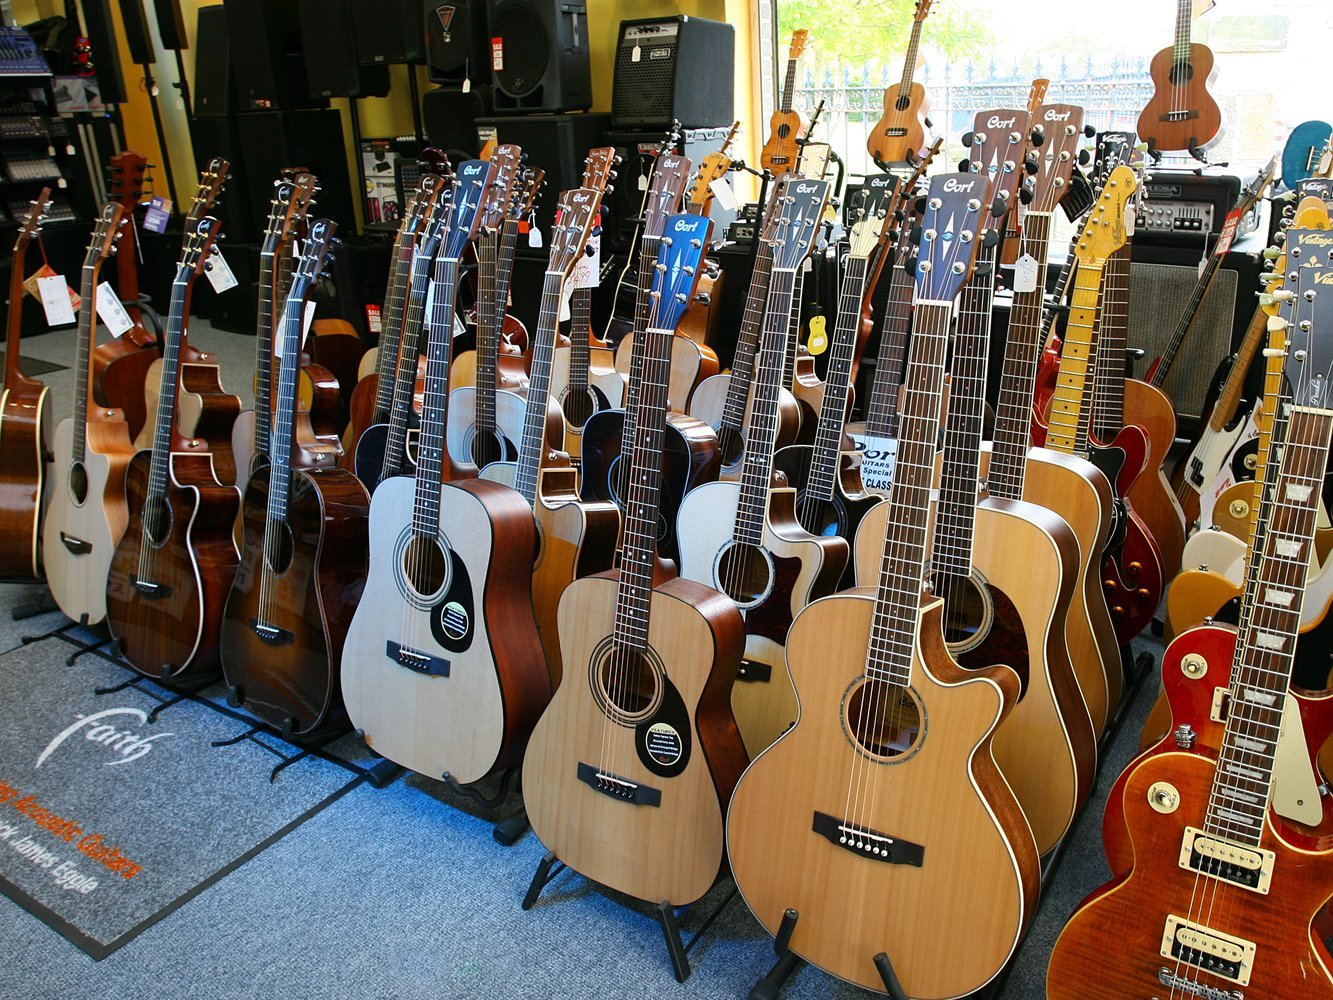 multi-sized guitars